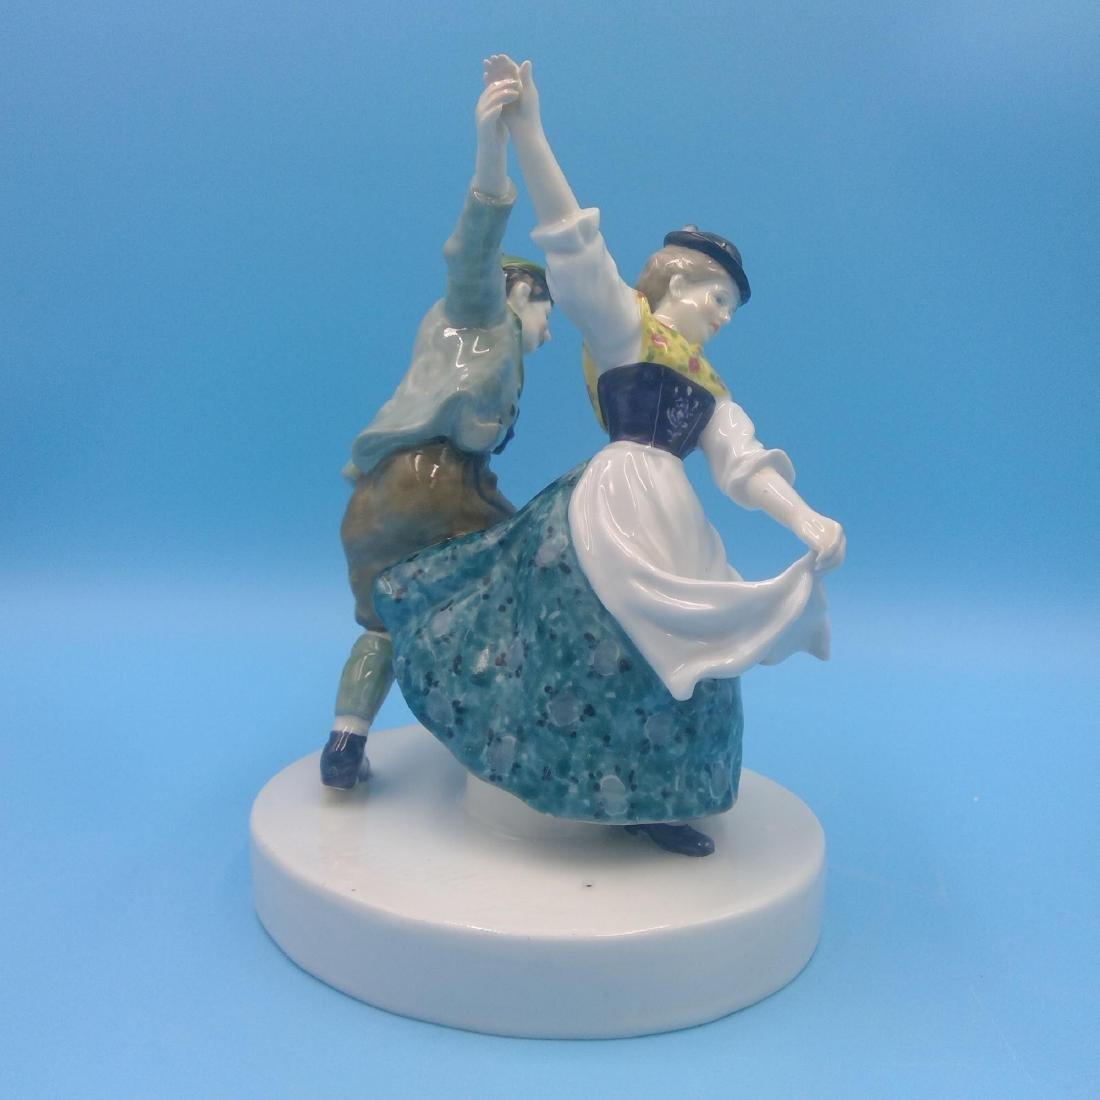 KARL ENS GERMAN PORCELAIN FIGURINE DANCING COUPLE - 4